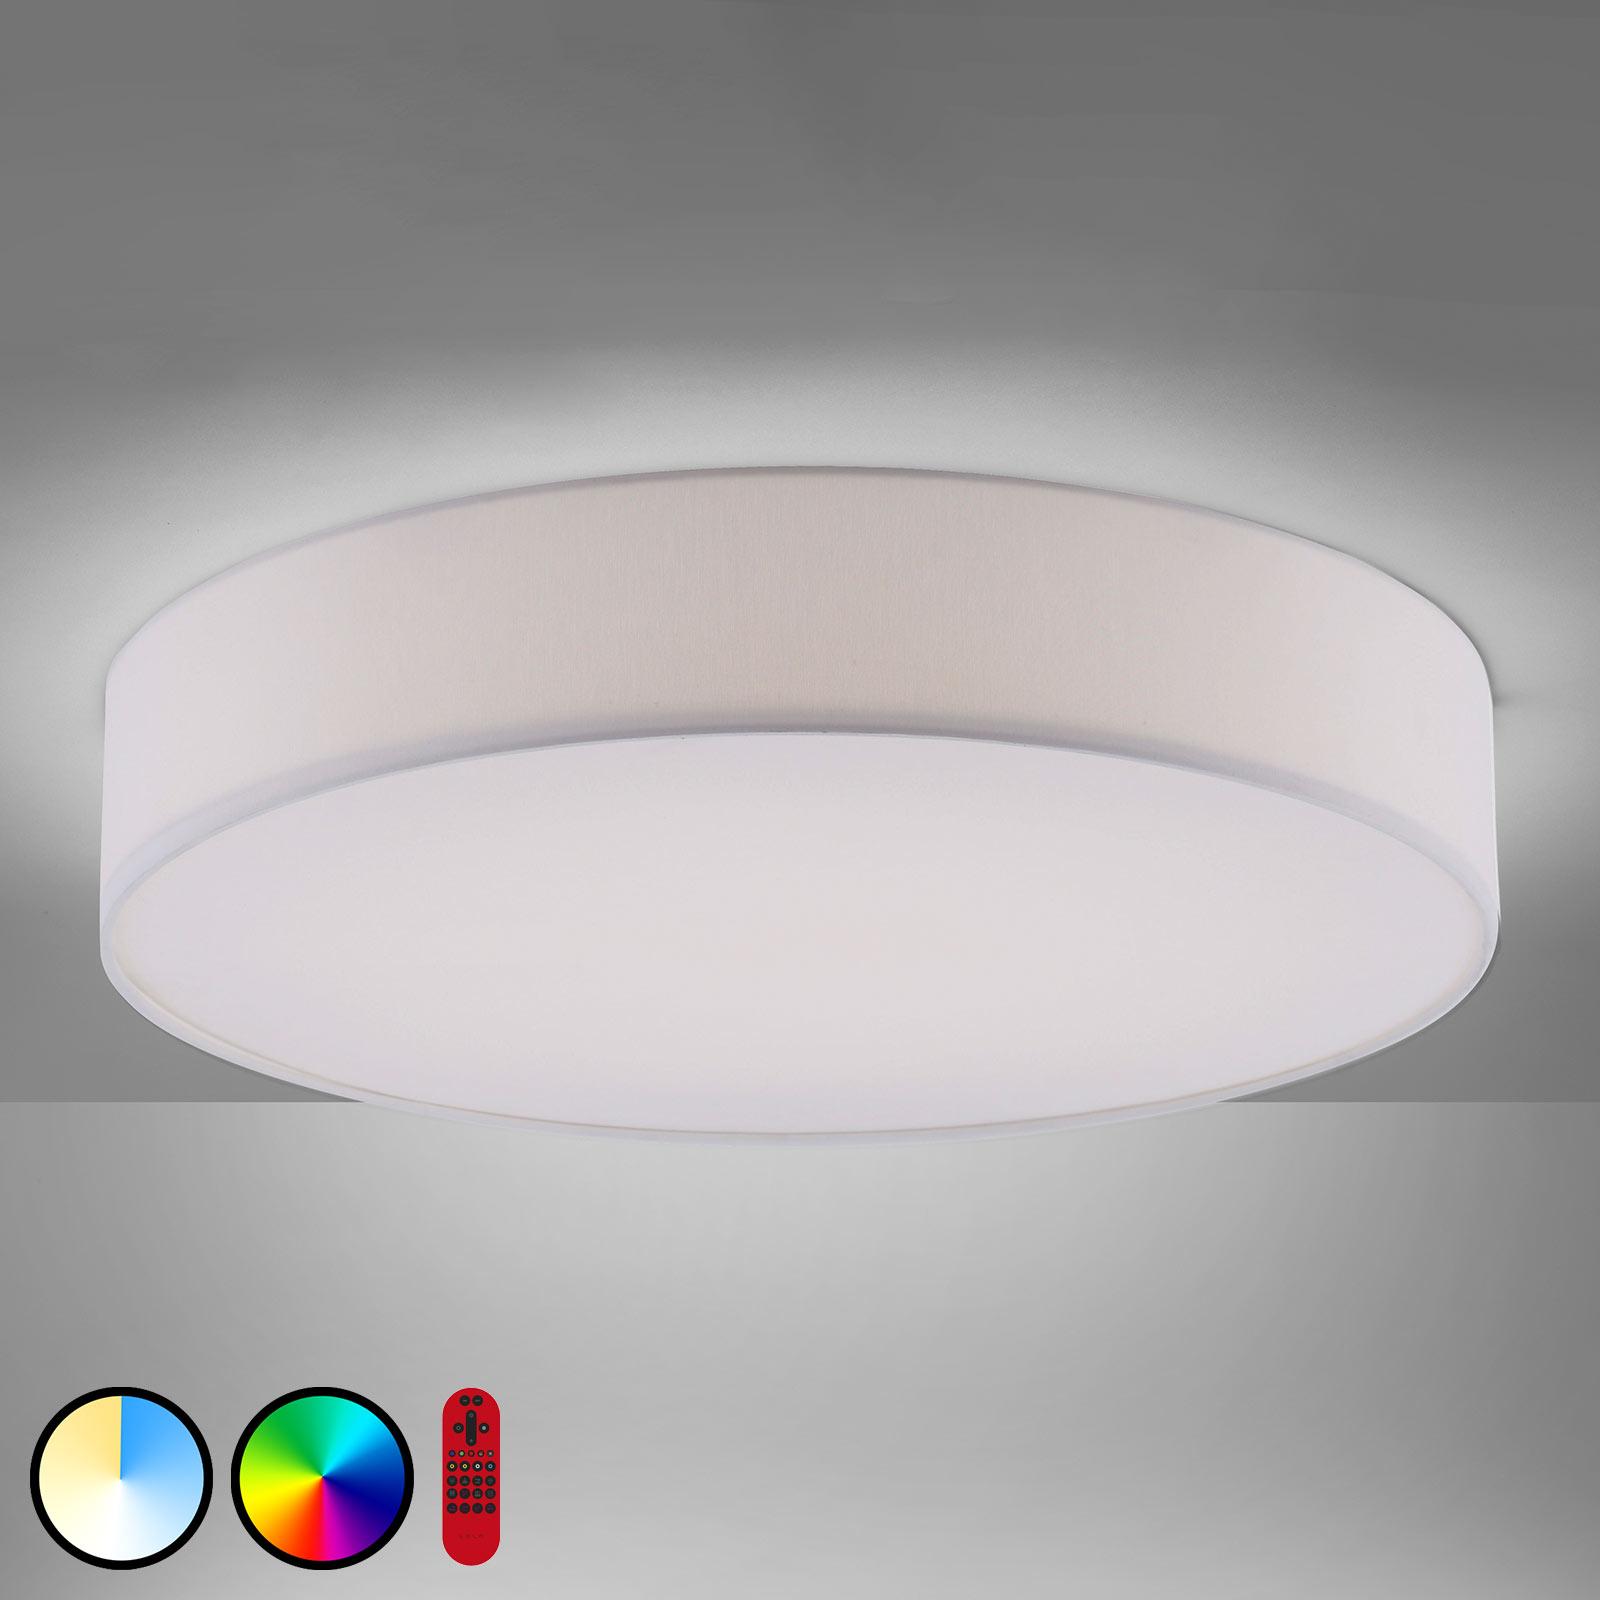 LED-Deckenleuchte LOLAsmart Kiara, Ø 58 cm